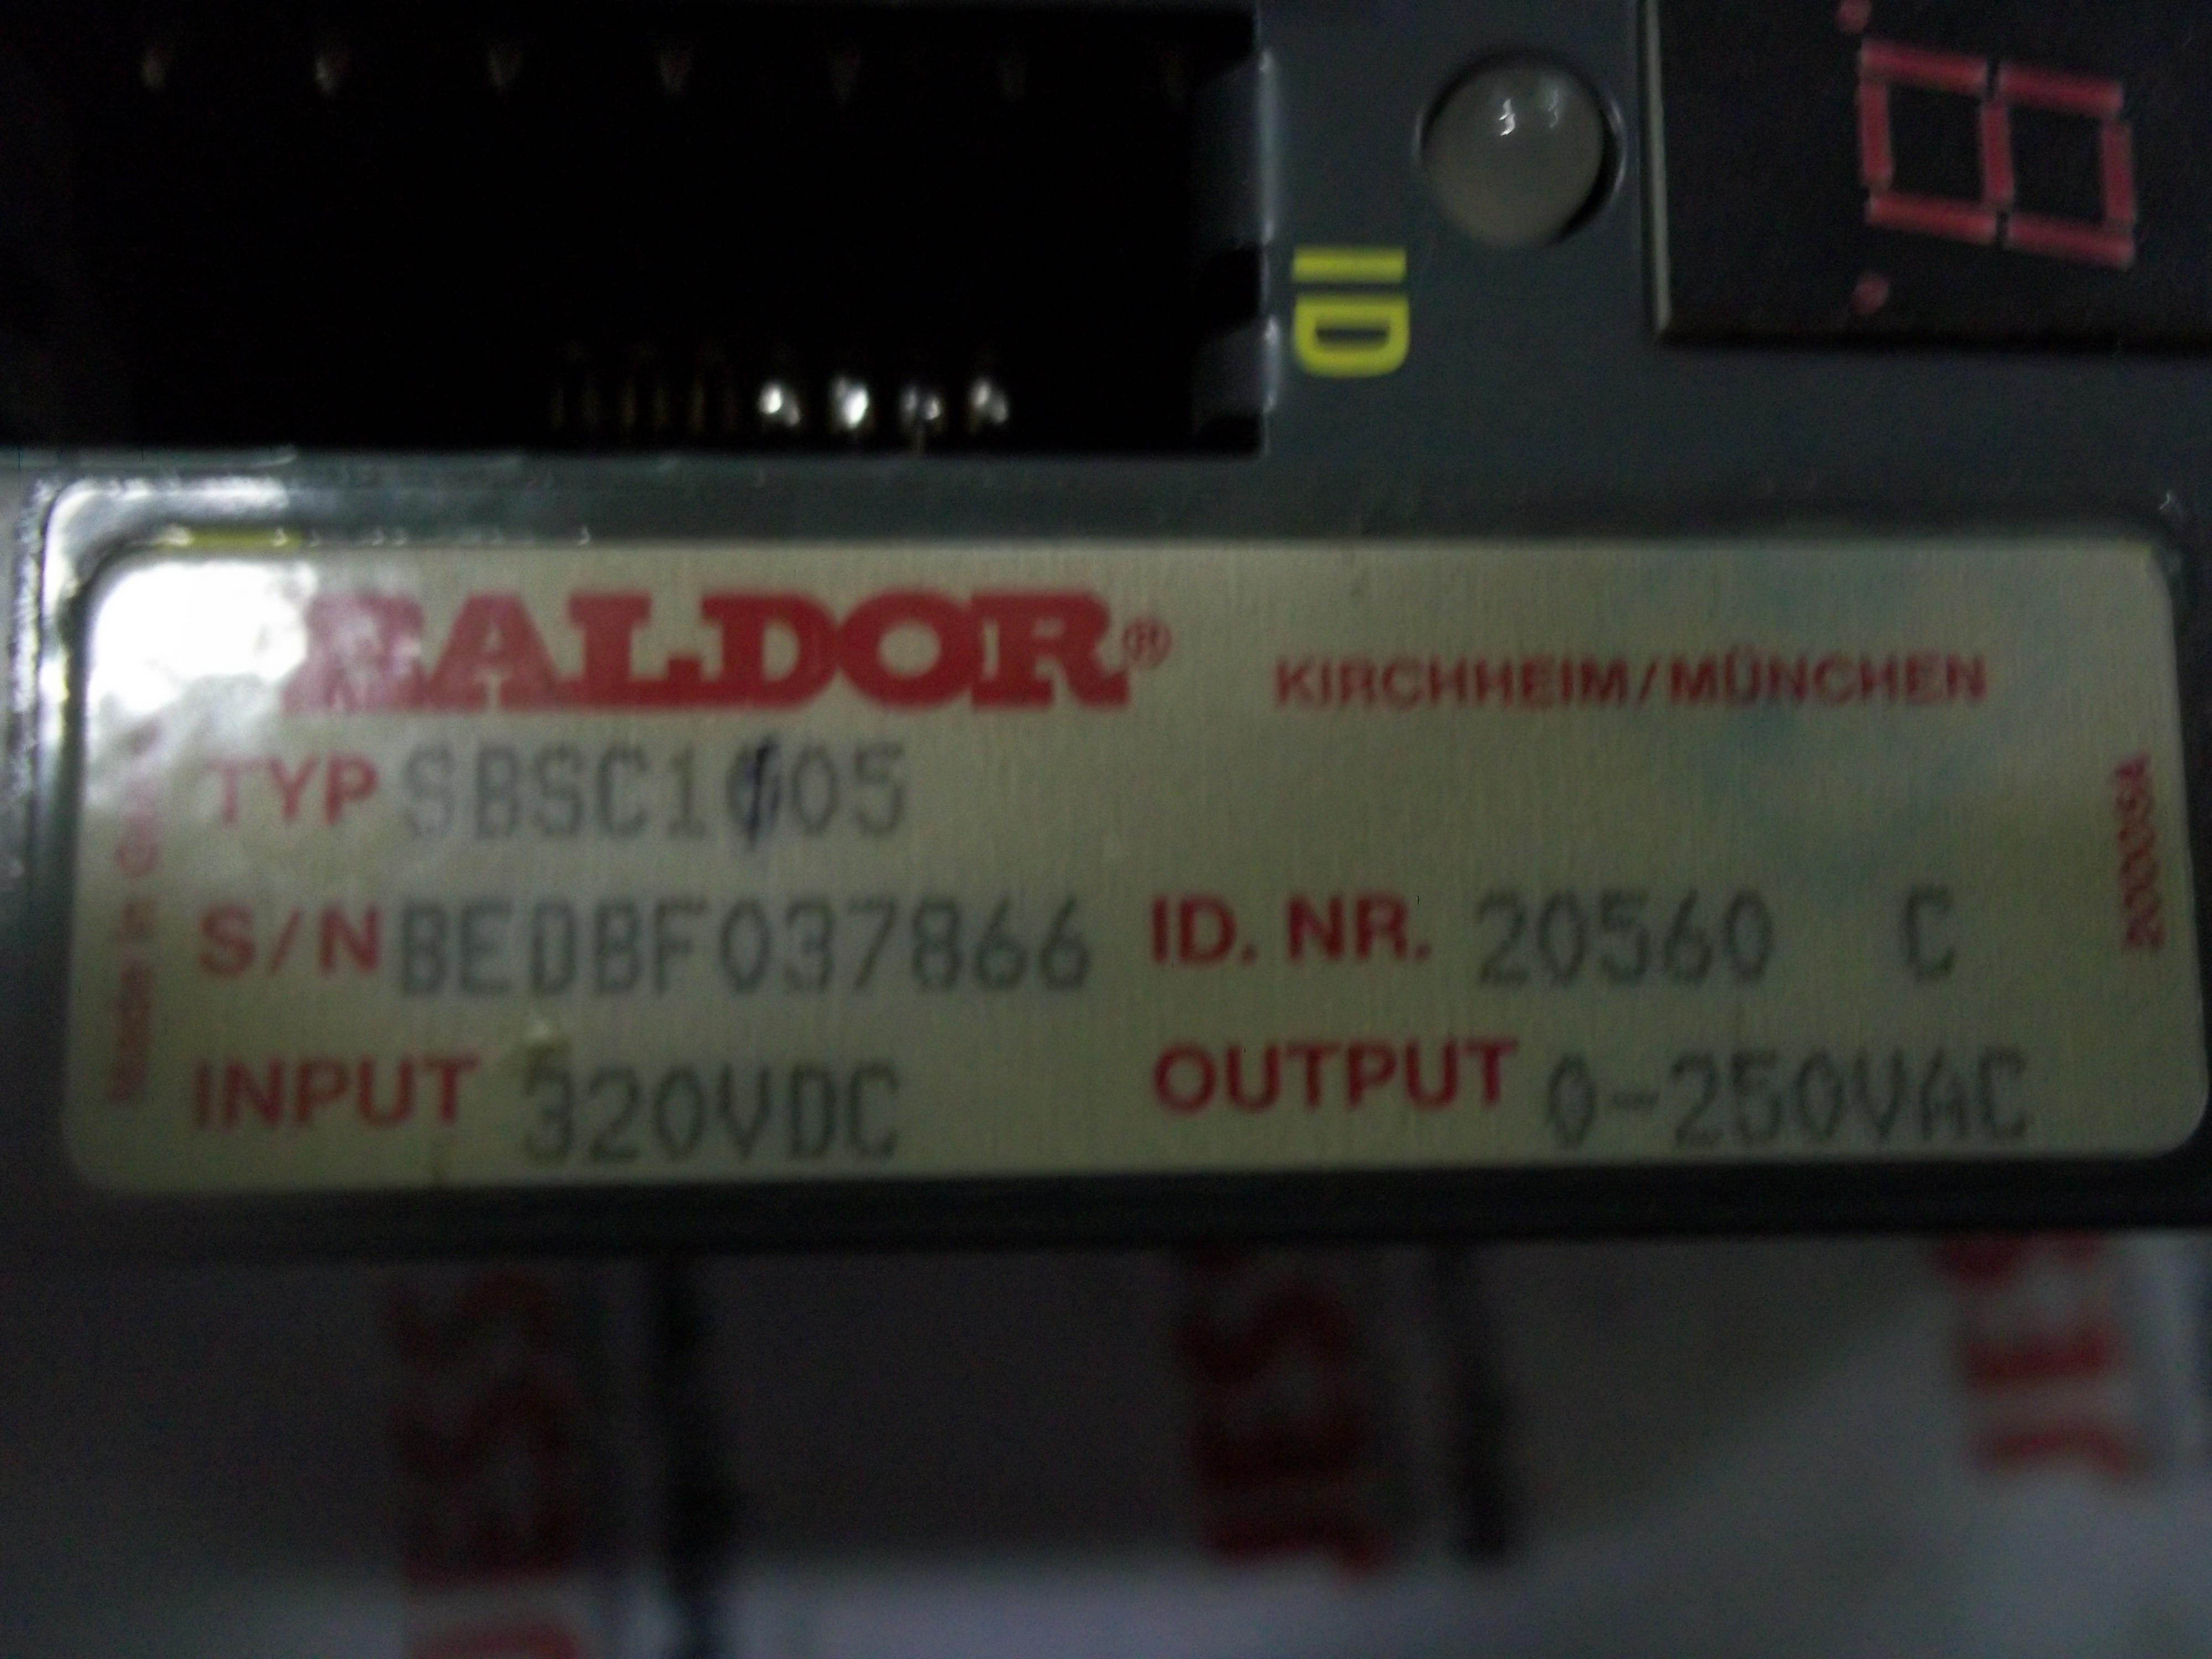 Repair SBSC1005 BALDOR BALDOR SERVO DRIVE in Malaysia, Singapore, Thailand, Indonesia